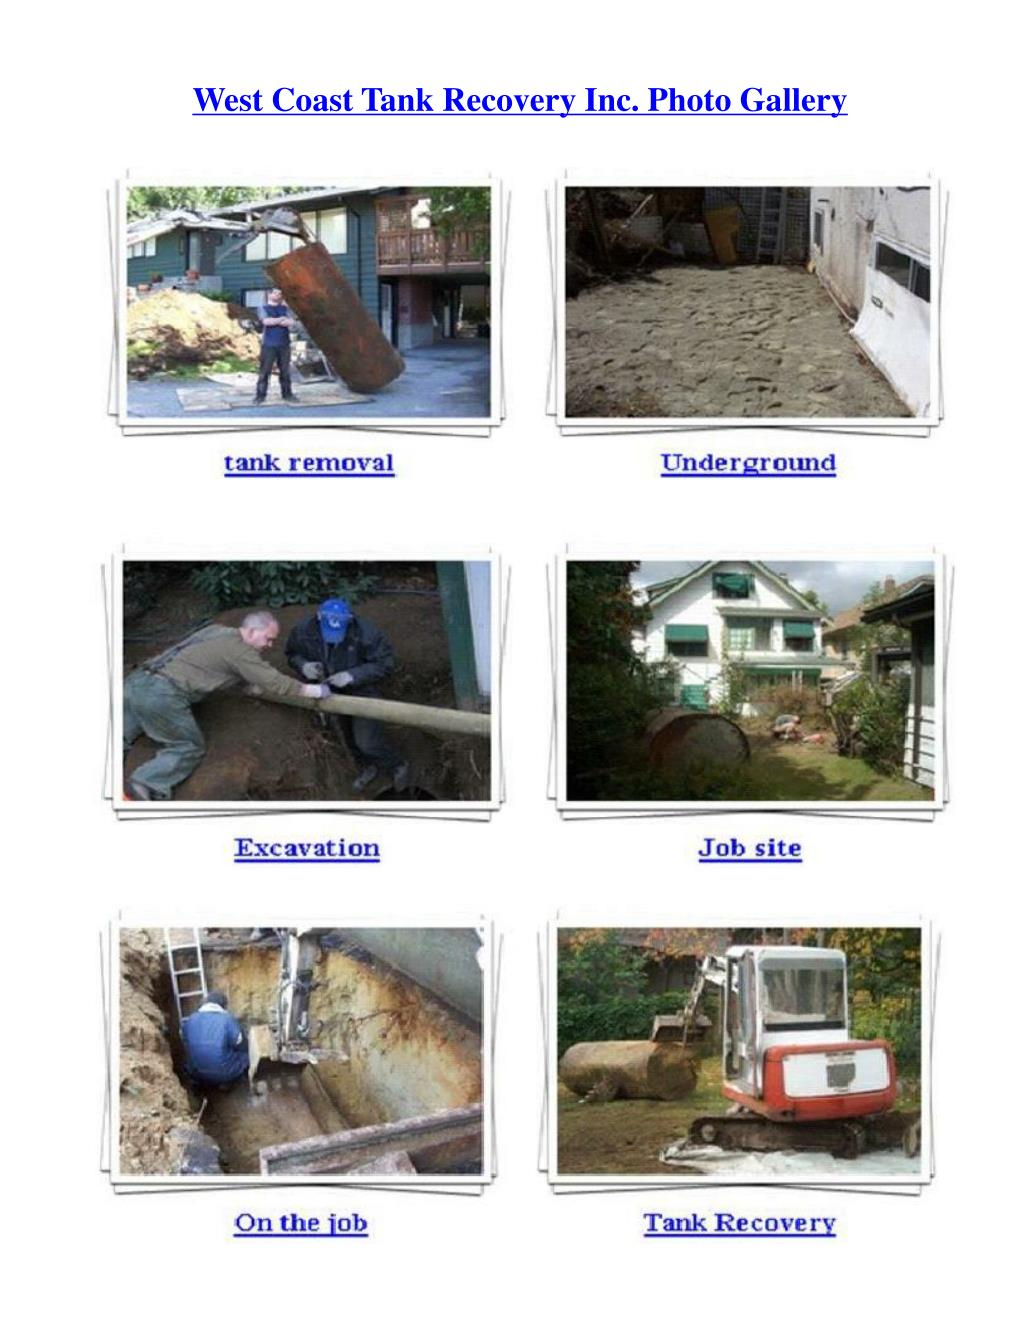 West Coast Tank Recovery Inc. Photo Gallery